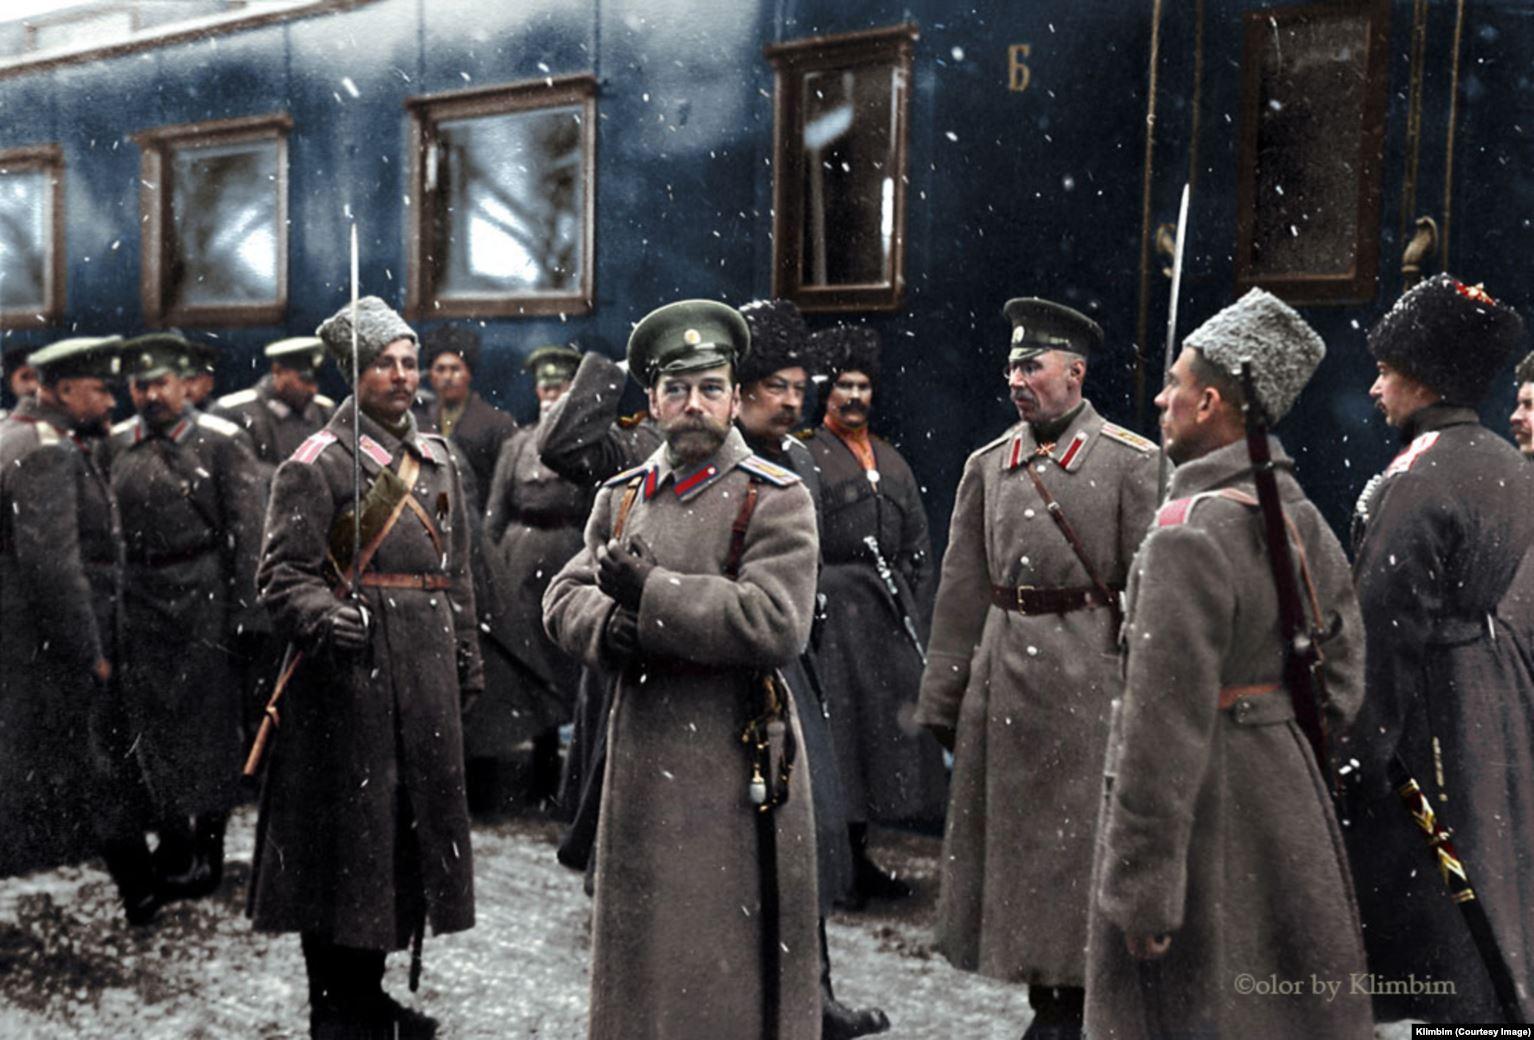 A 1916 image of Russian Tsar Nicholas II colorized by Shirnina.